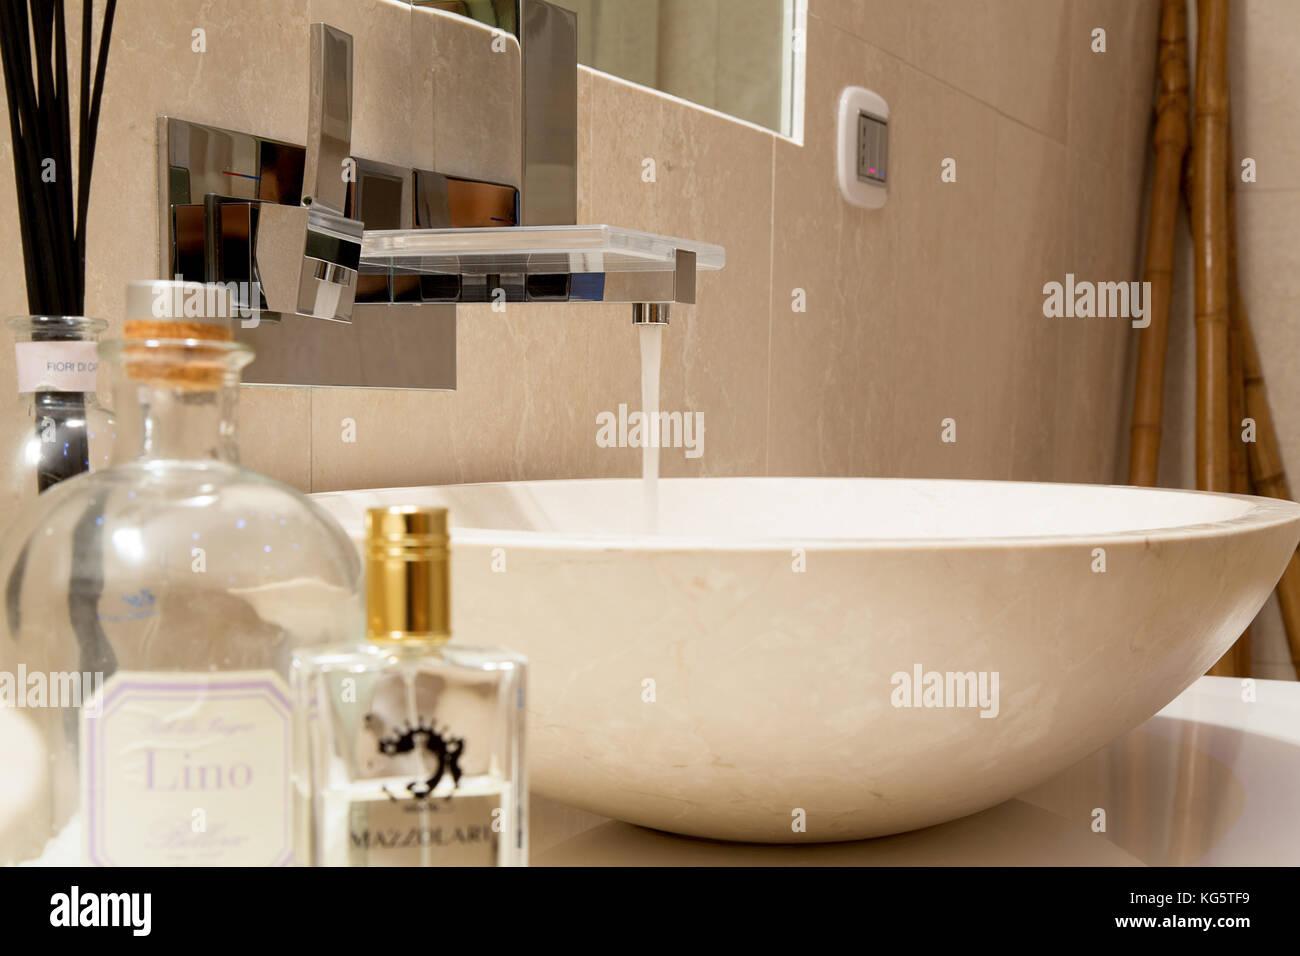 Luxury Bath Stock Photos Luxury Bath Stock Images Alamy - Villa-in-sardinia-by-antonio-lupi